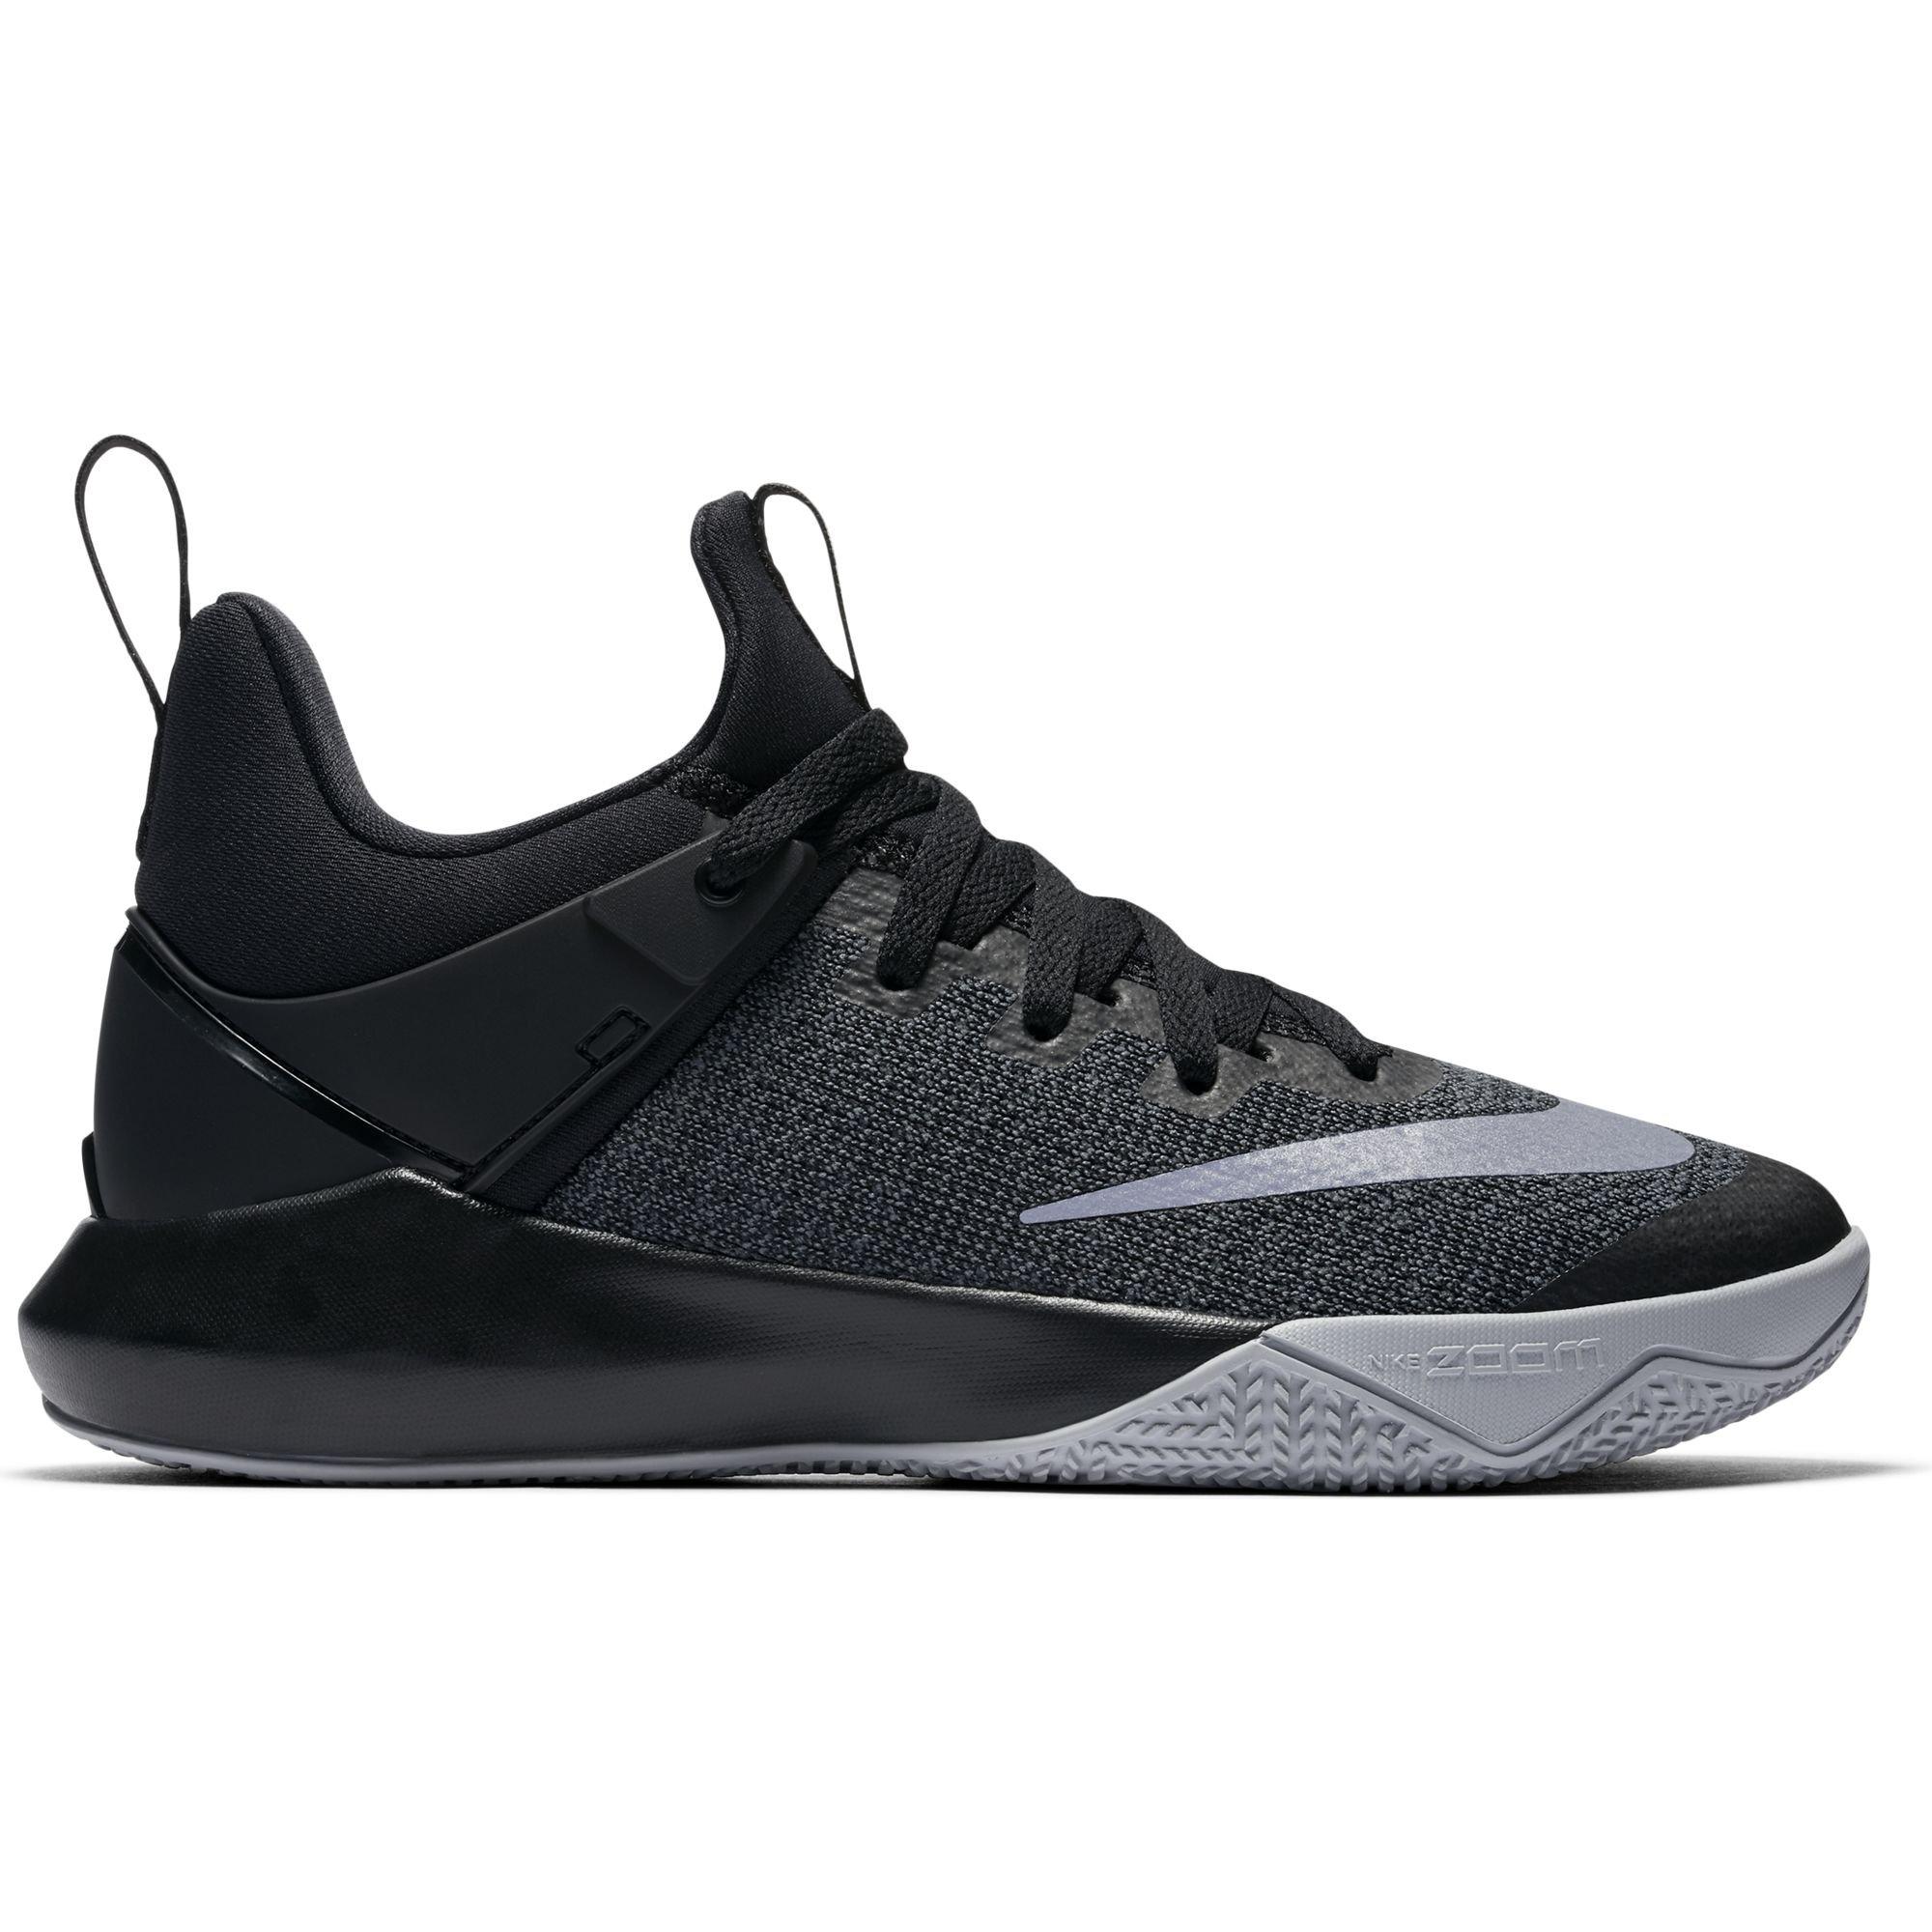 Nike Women's Zoom Shift Basketball Shoe Black/Chrome/Wolf Grey Size 10 M US